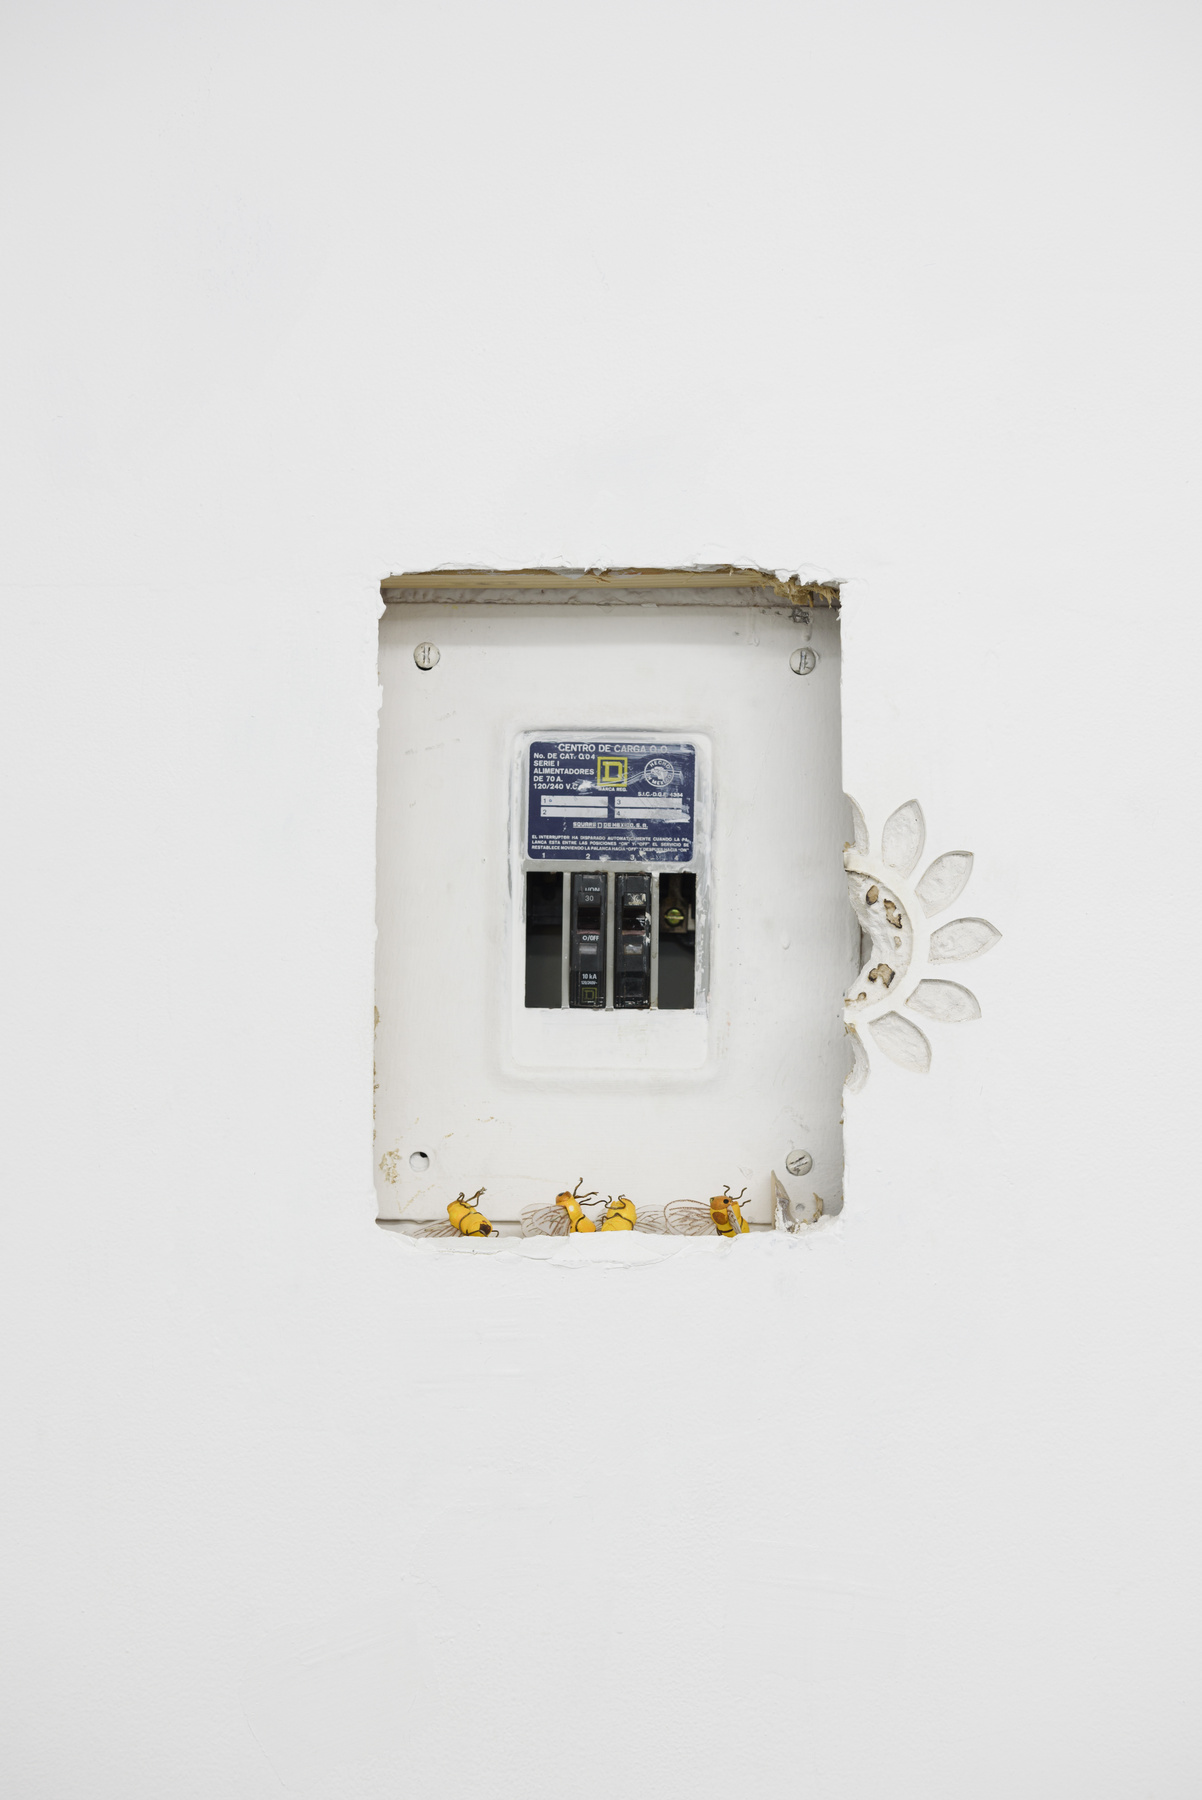 Michael Assiff-Ozone Flowers 17